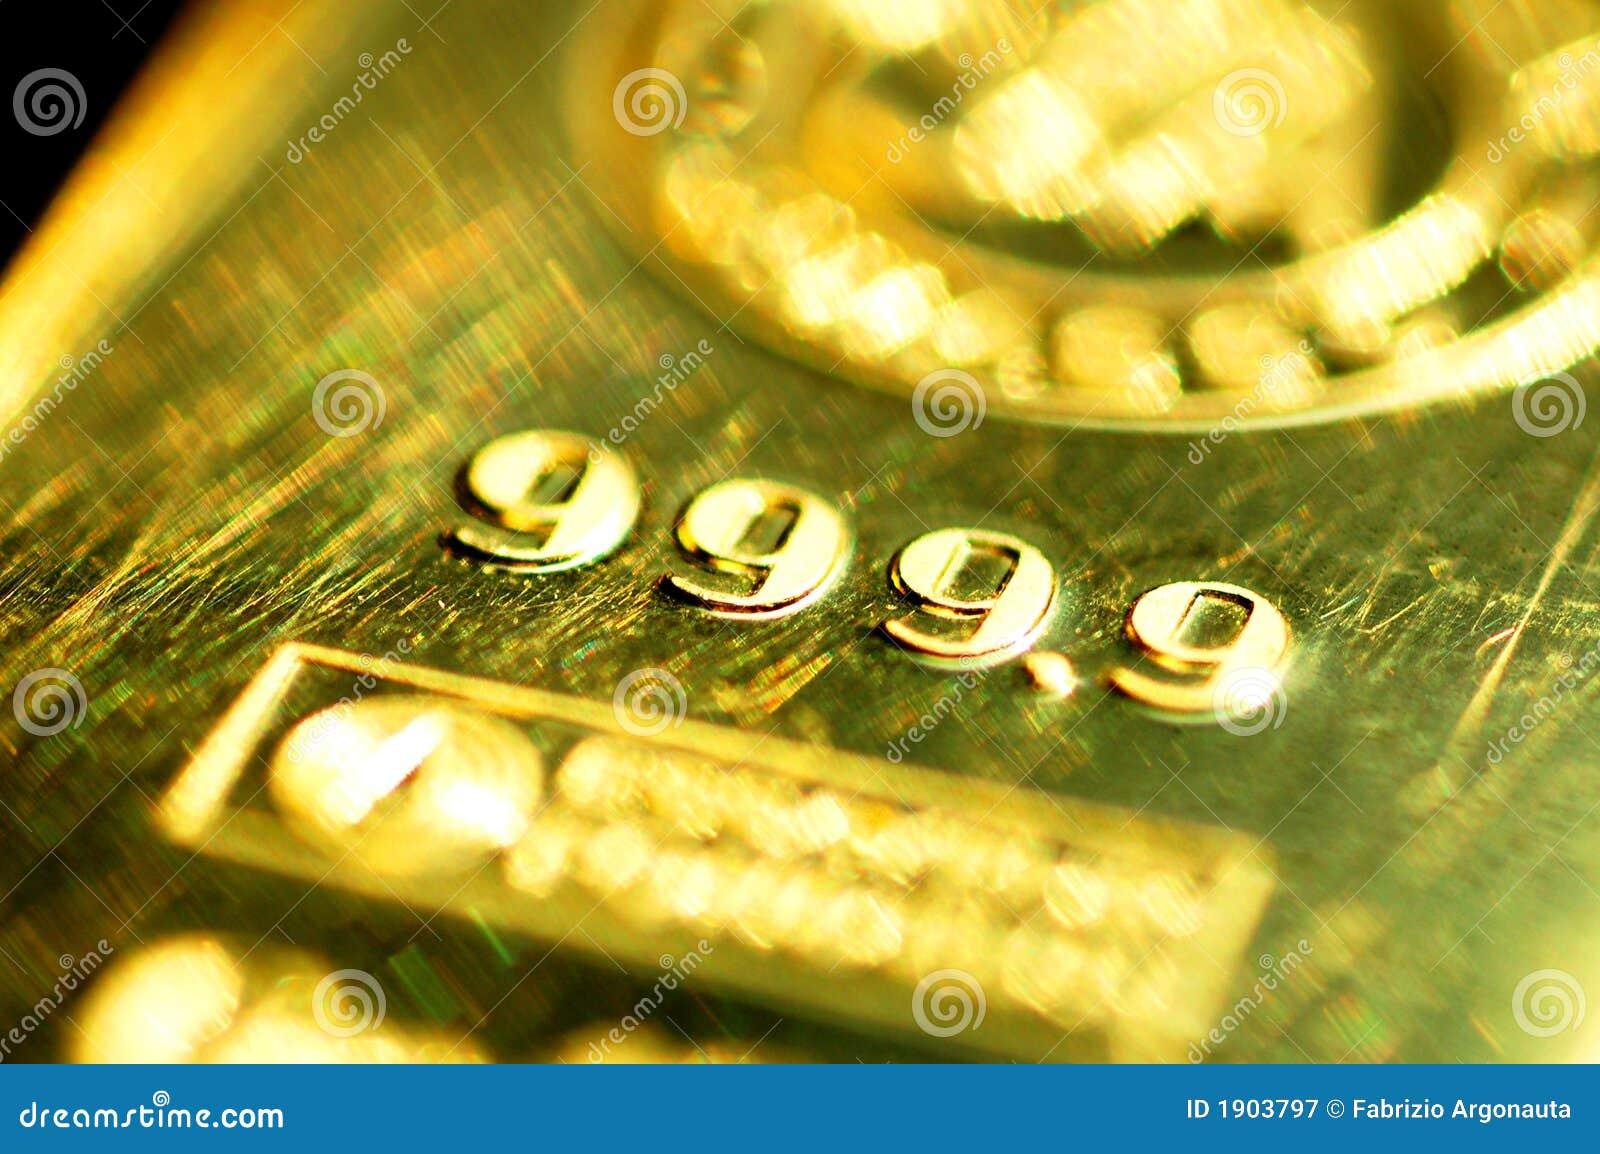 9 999 bar den rena guldtackan